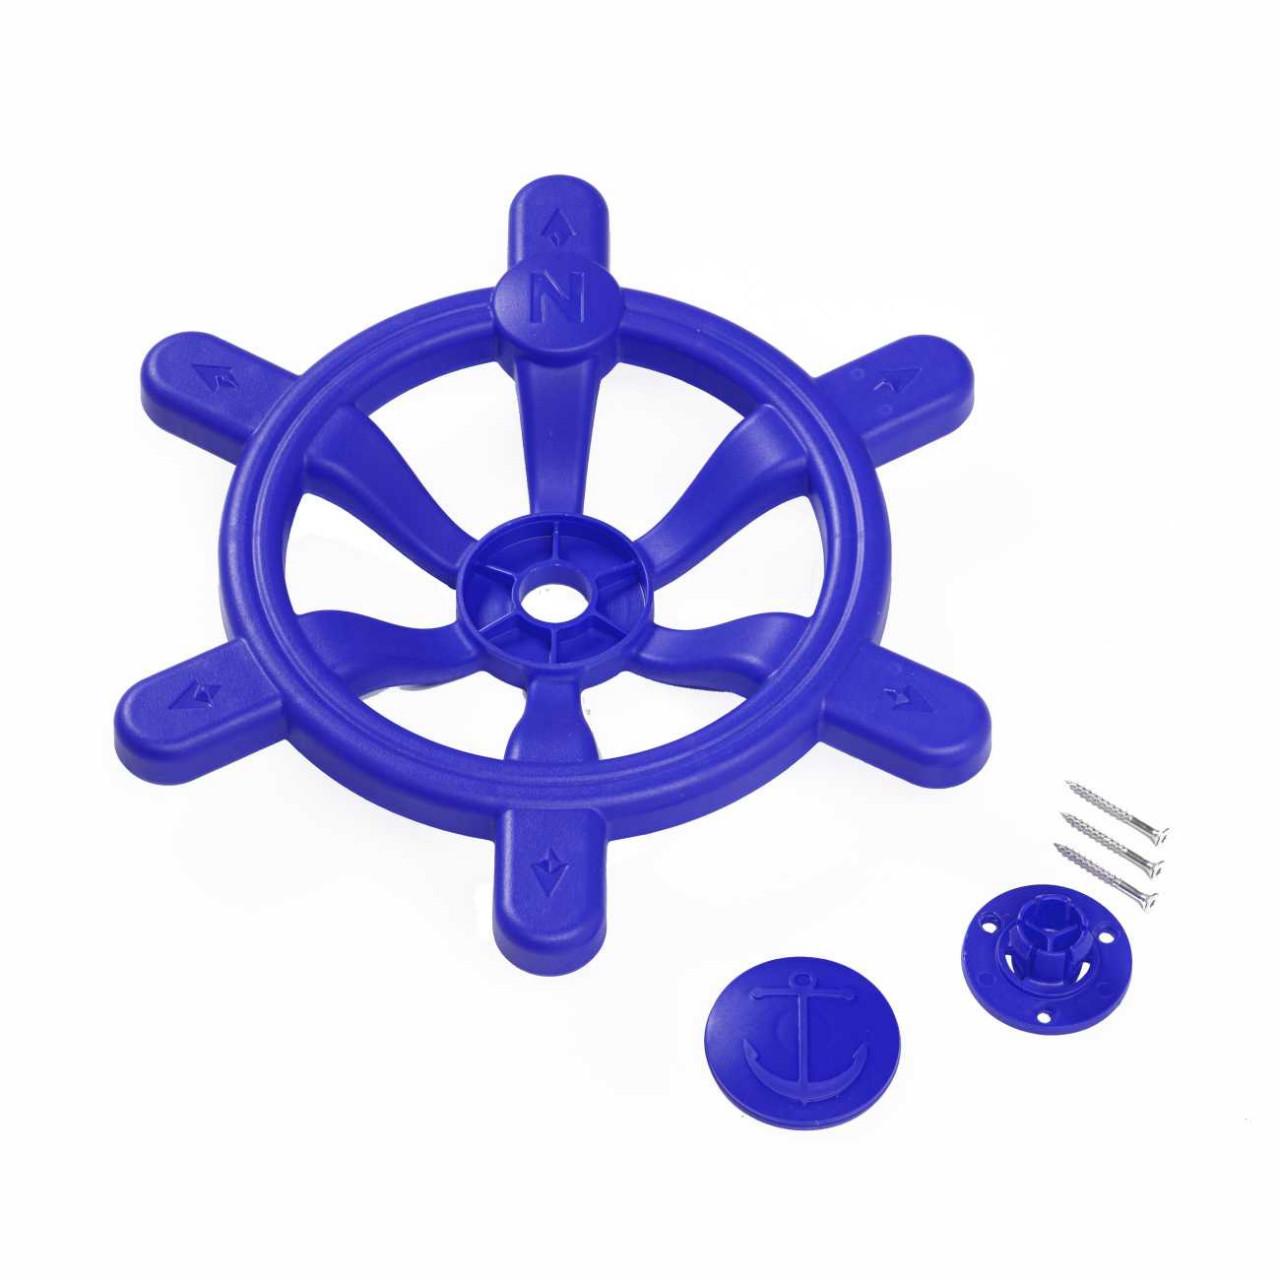 Spielturm Lenkrad Diamant blau 36 cm Ø